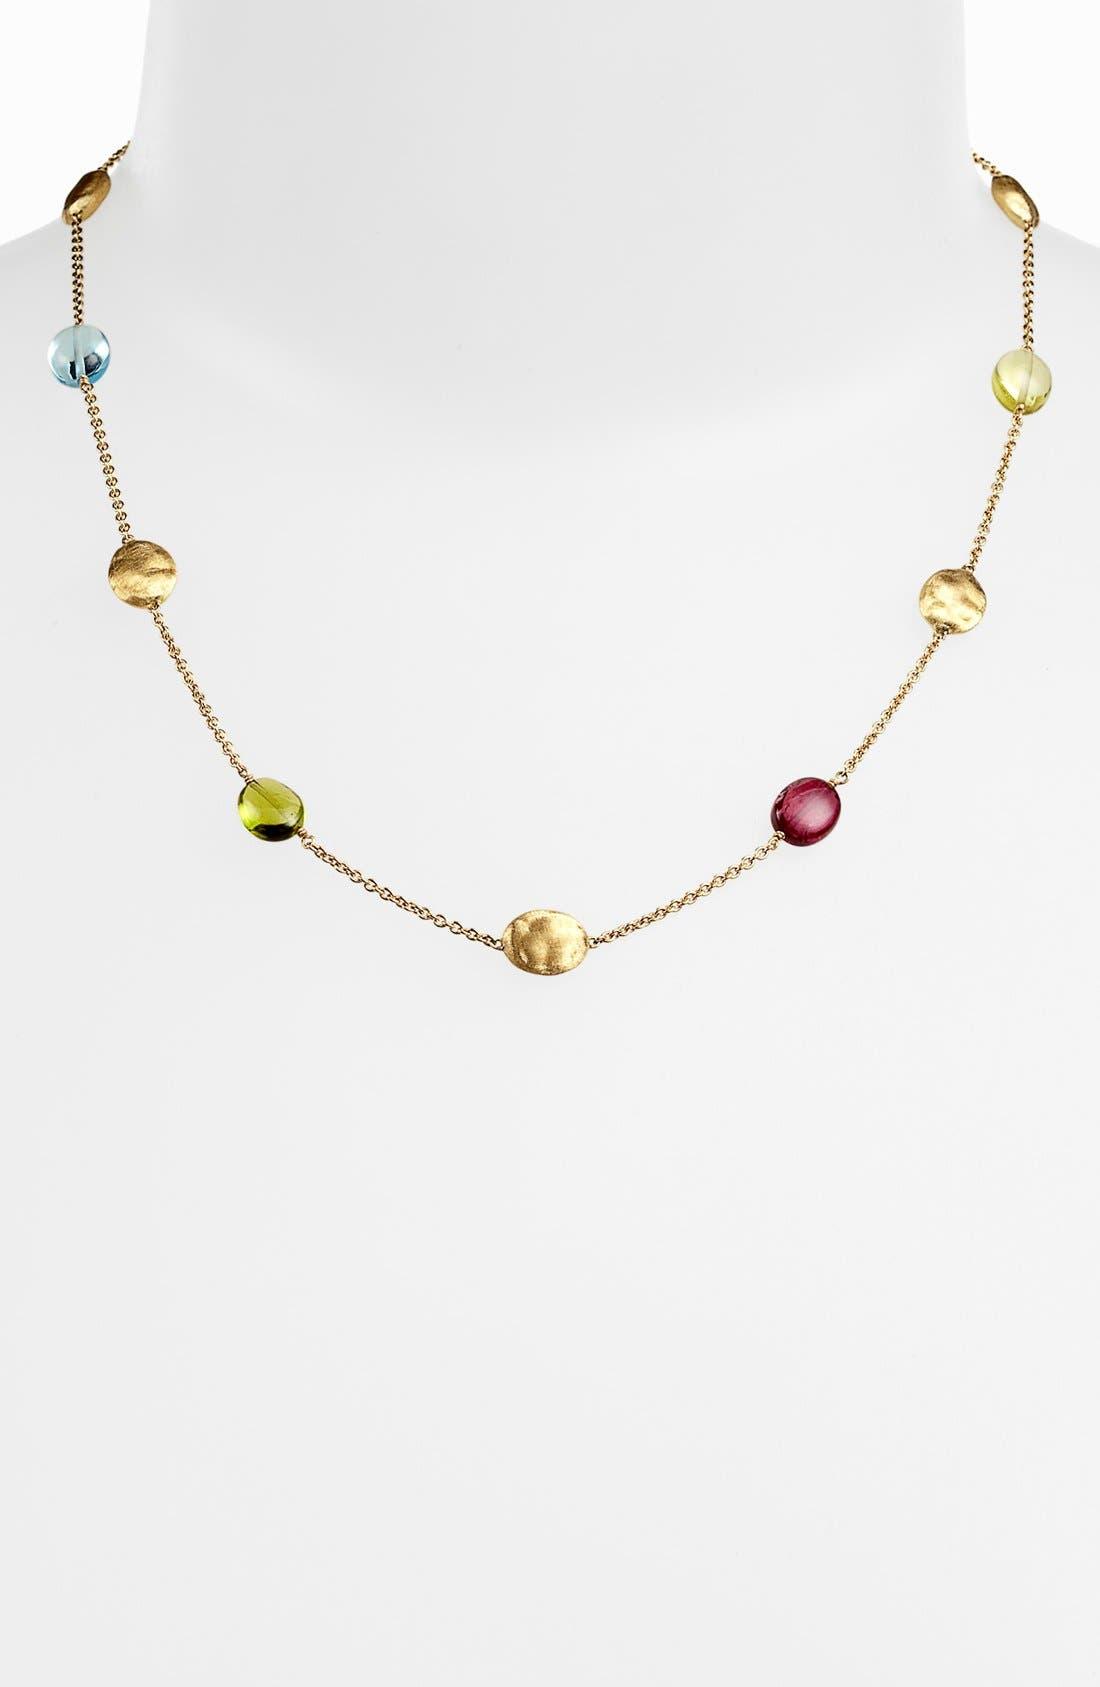 Main Image - Marco Bicego 'Siviglia' Semiprecious Station Necklace